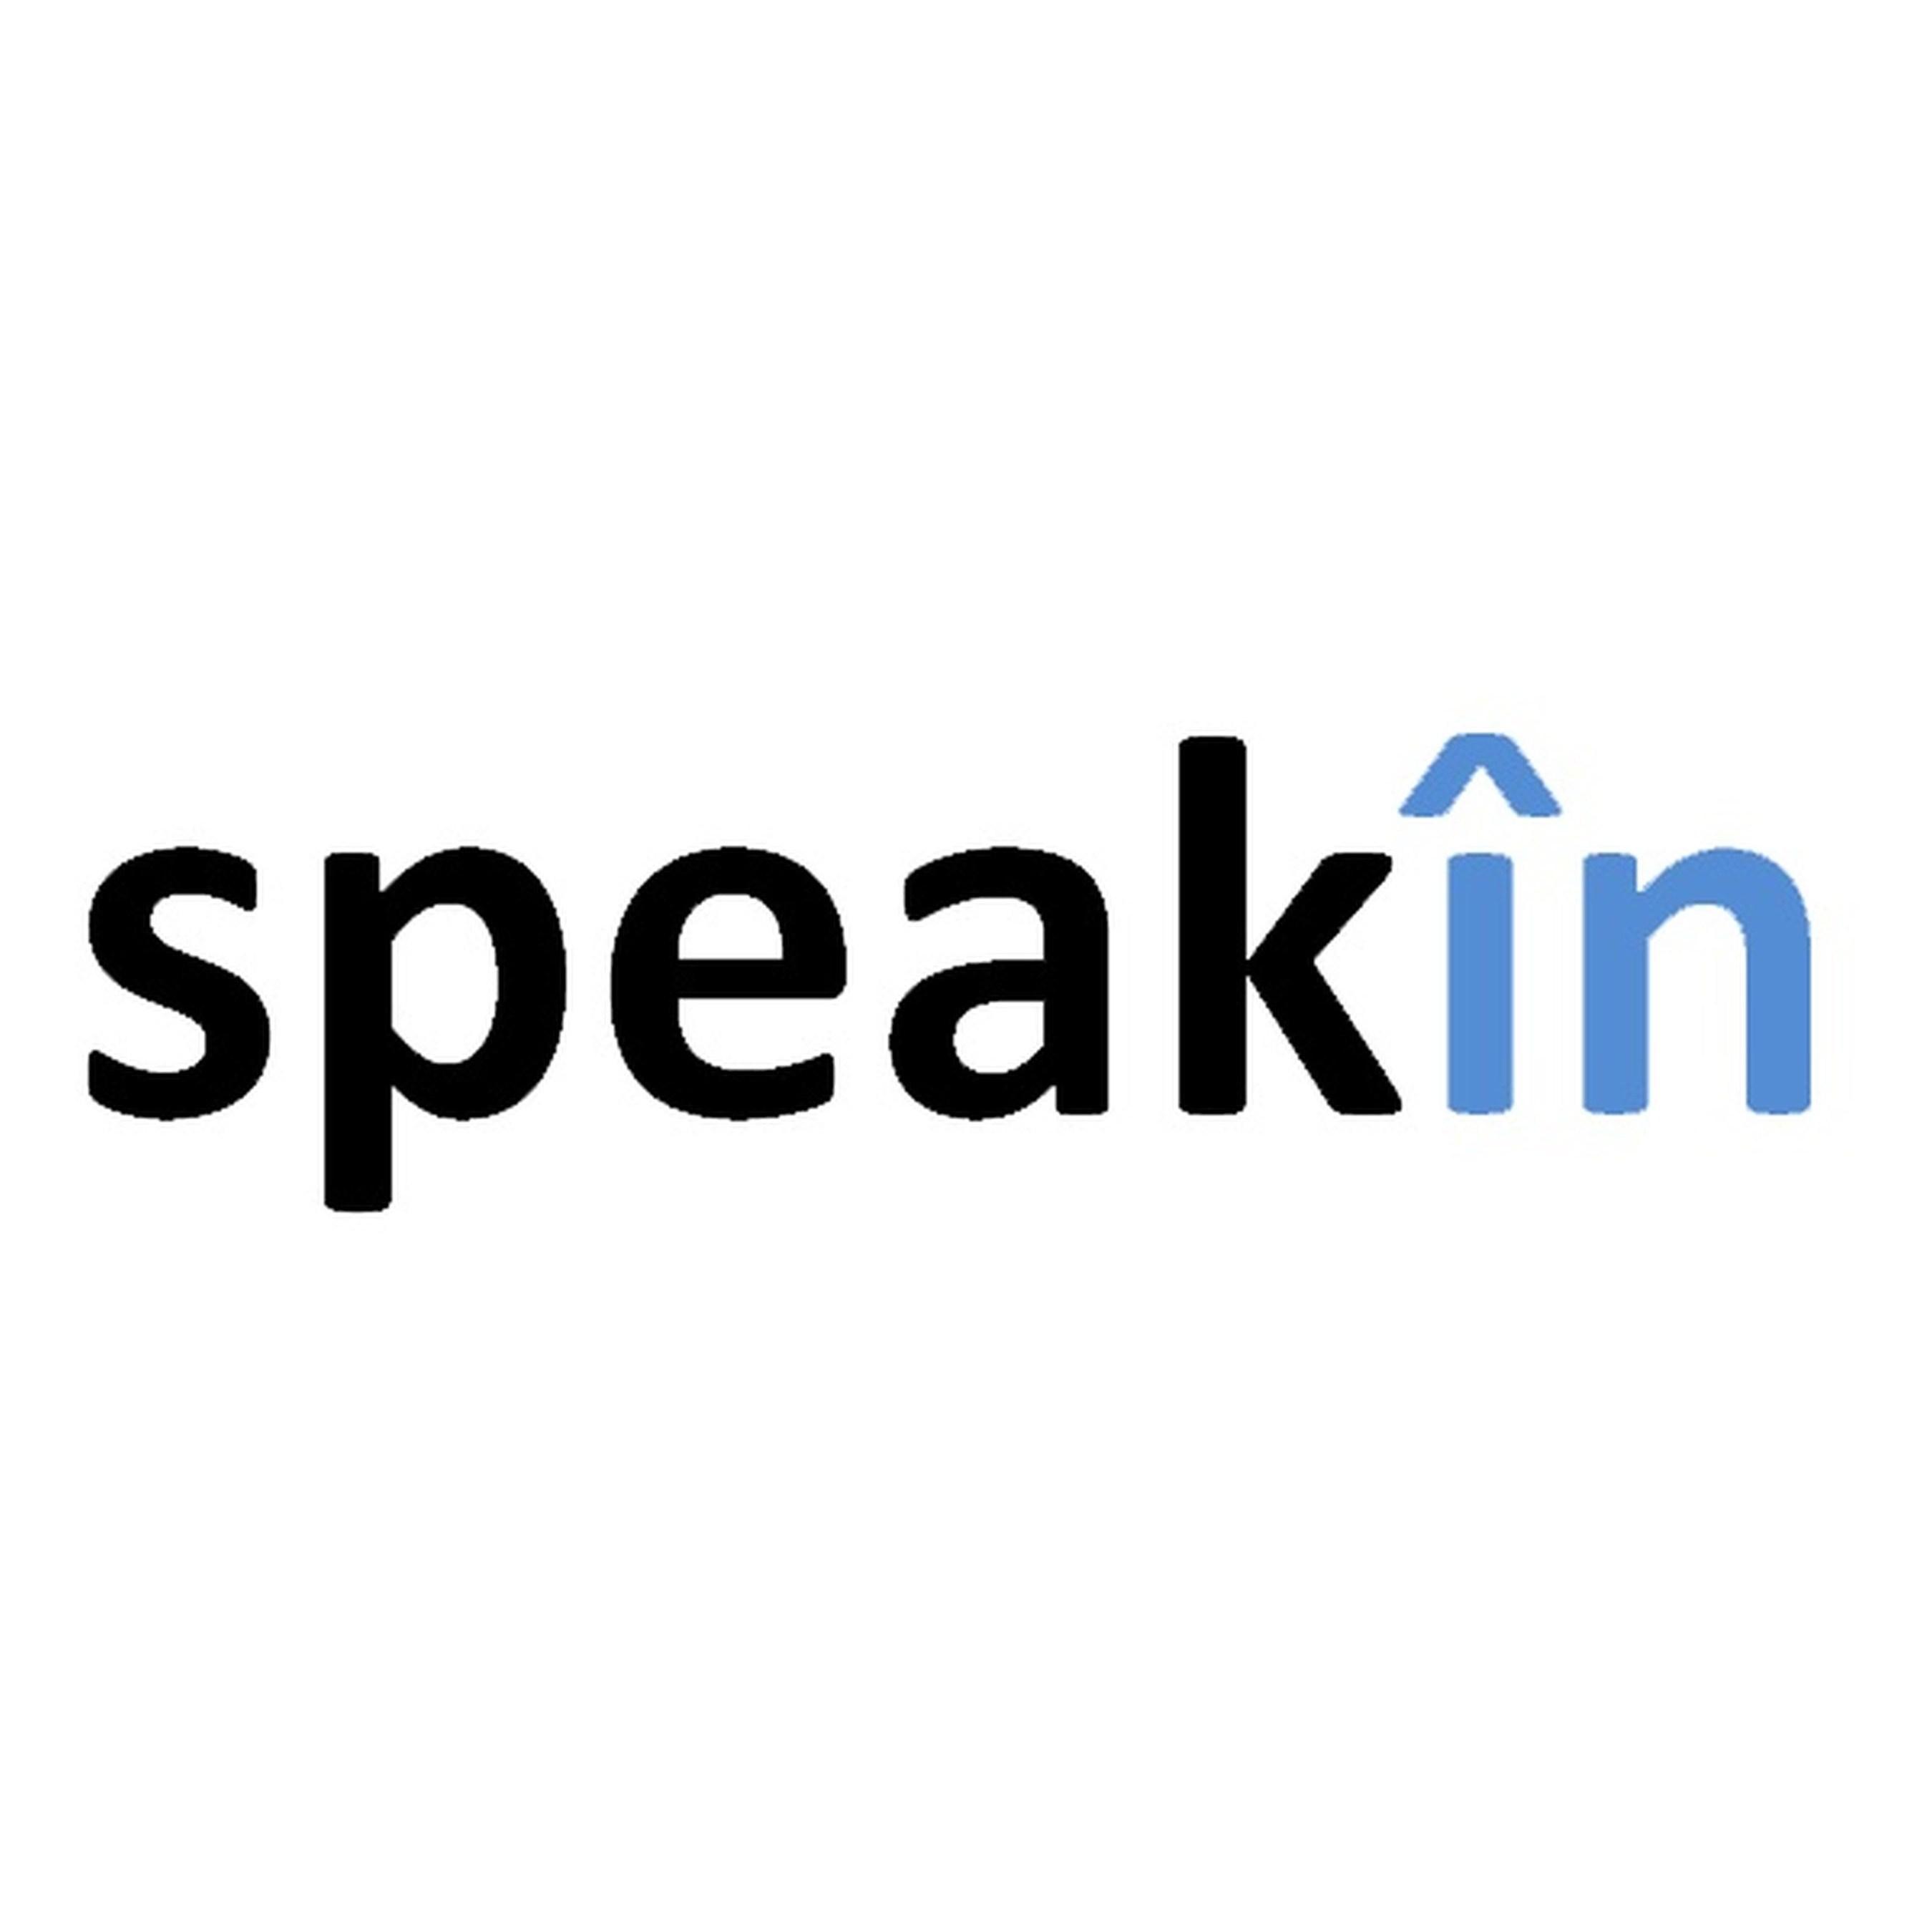 SpeakIn company logo